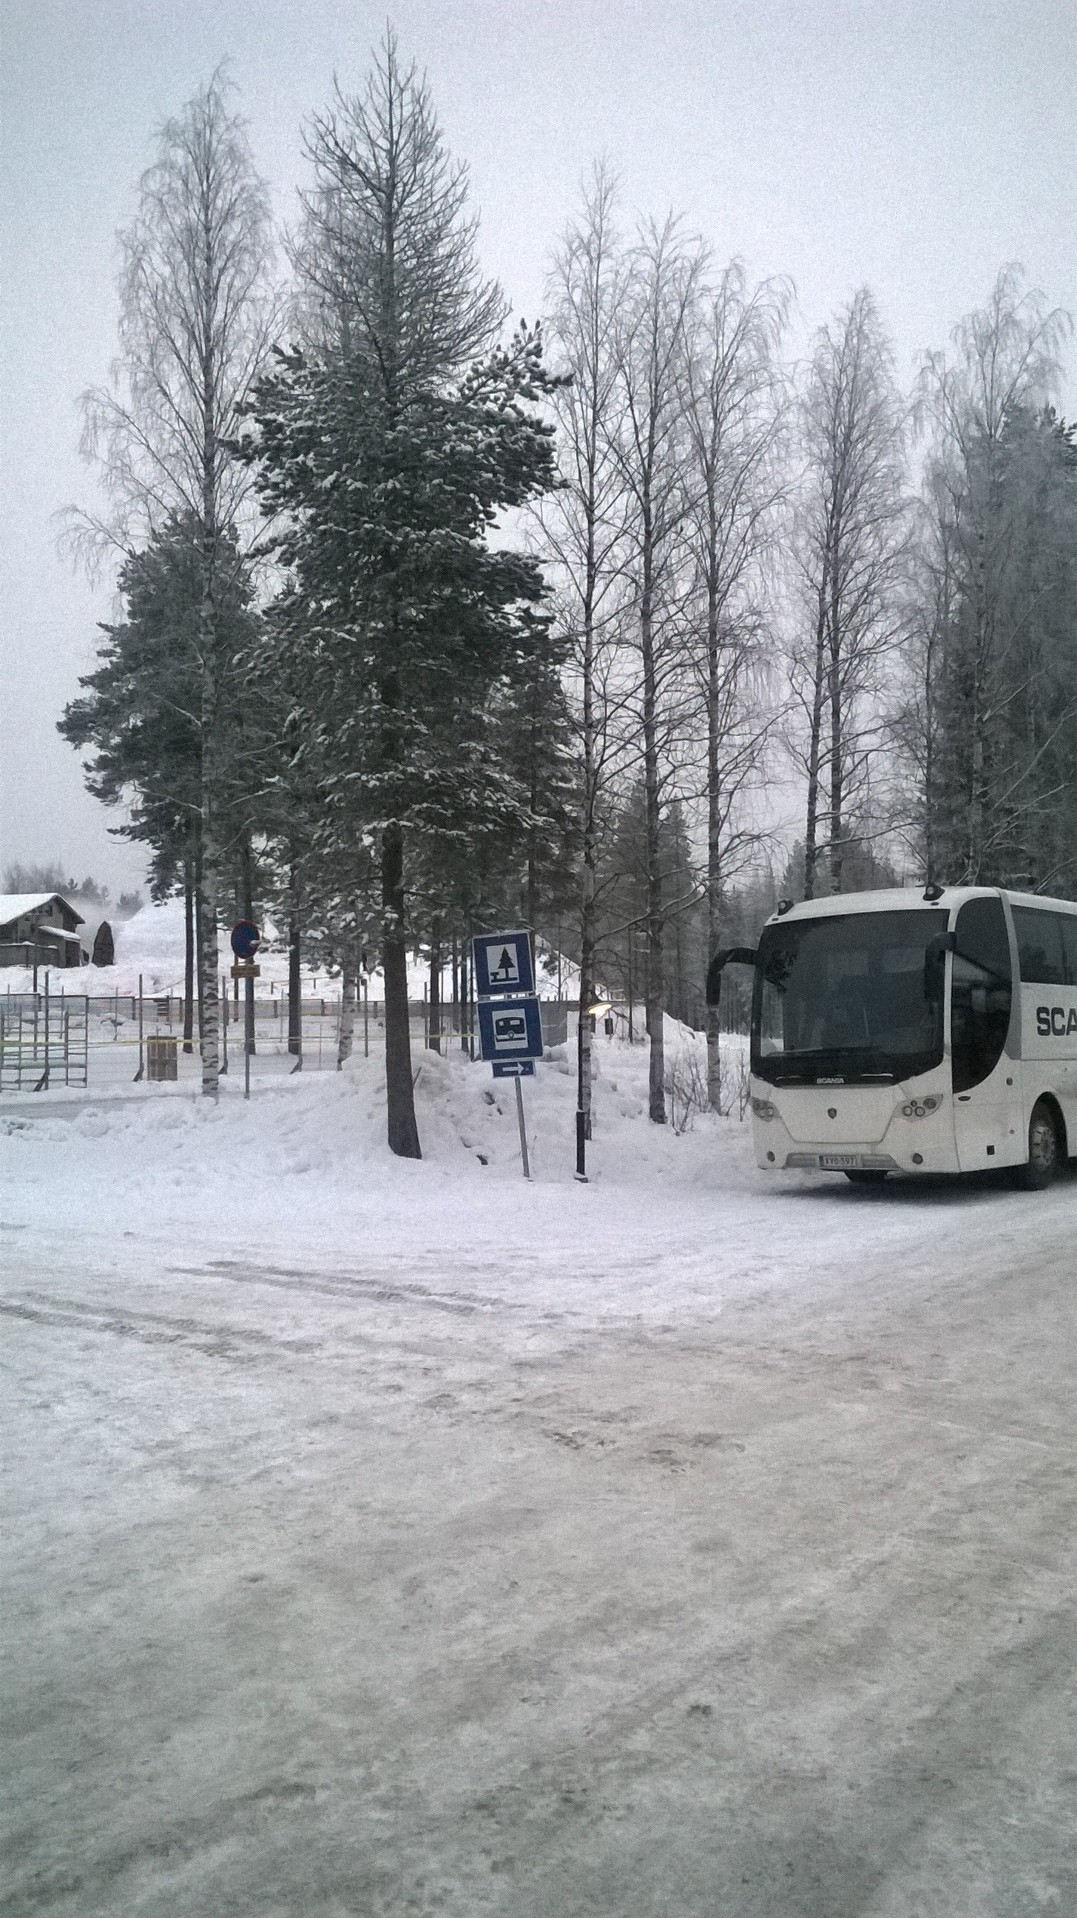 viajes-erasmus-laponia-finlandesa-i-f2d9